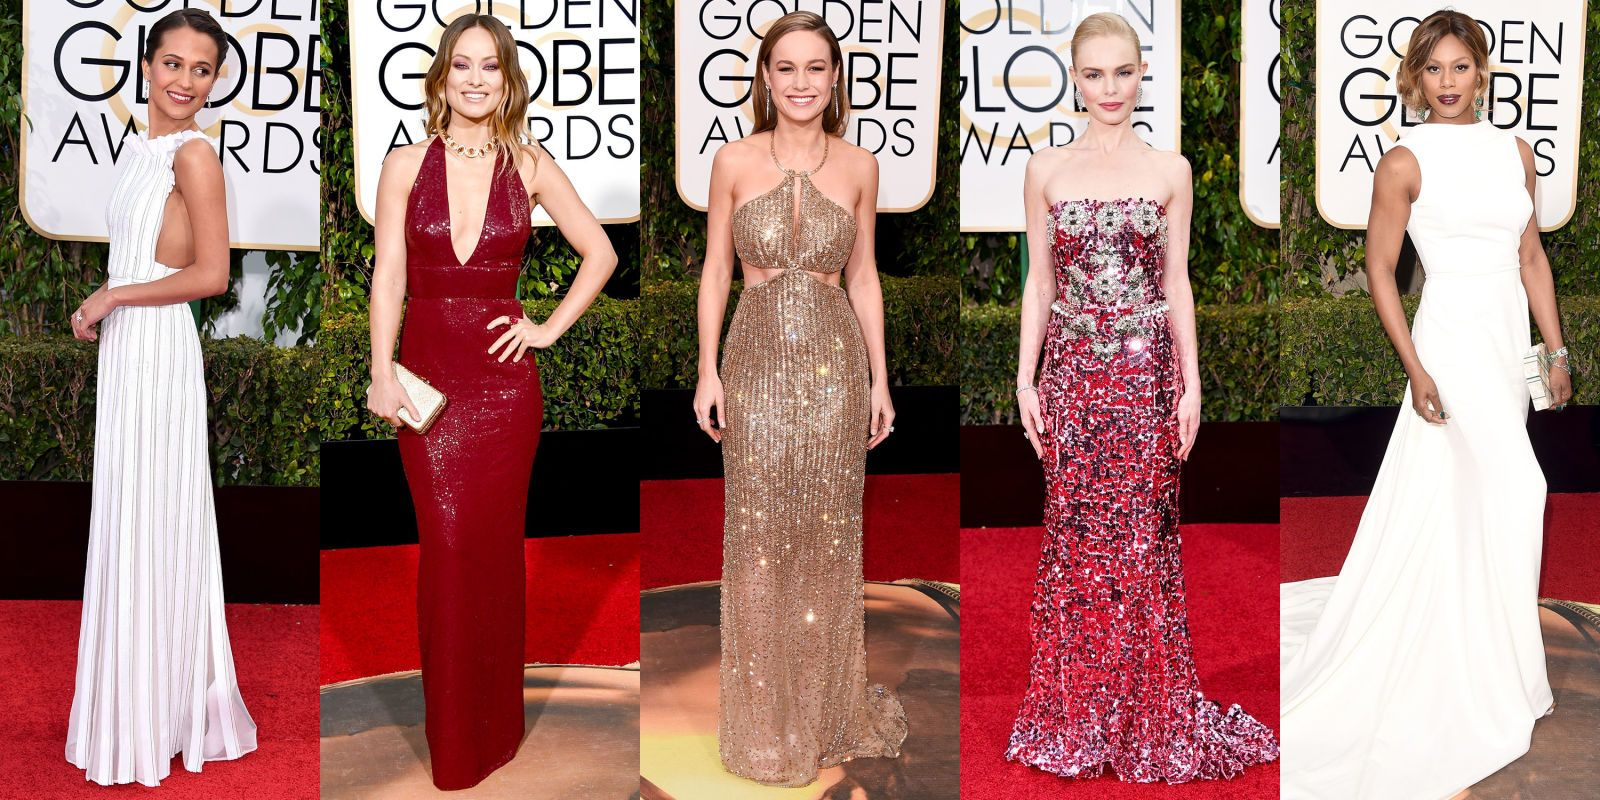 The Best Dressed at the 2016 Golden Globes  - ELLE.com